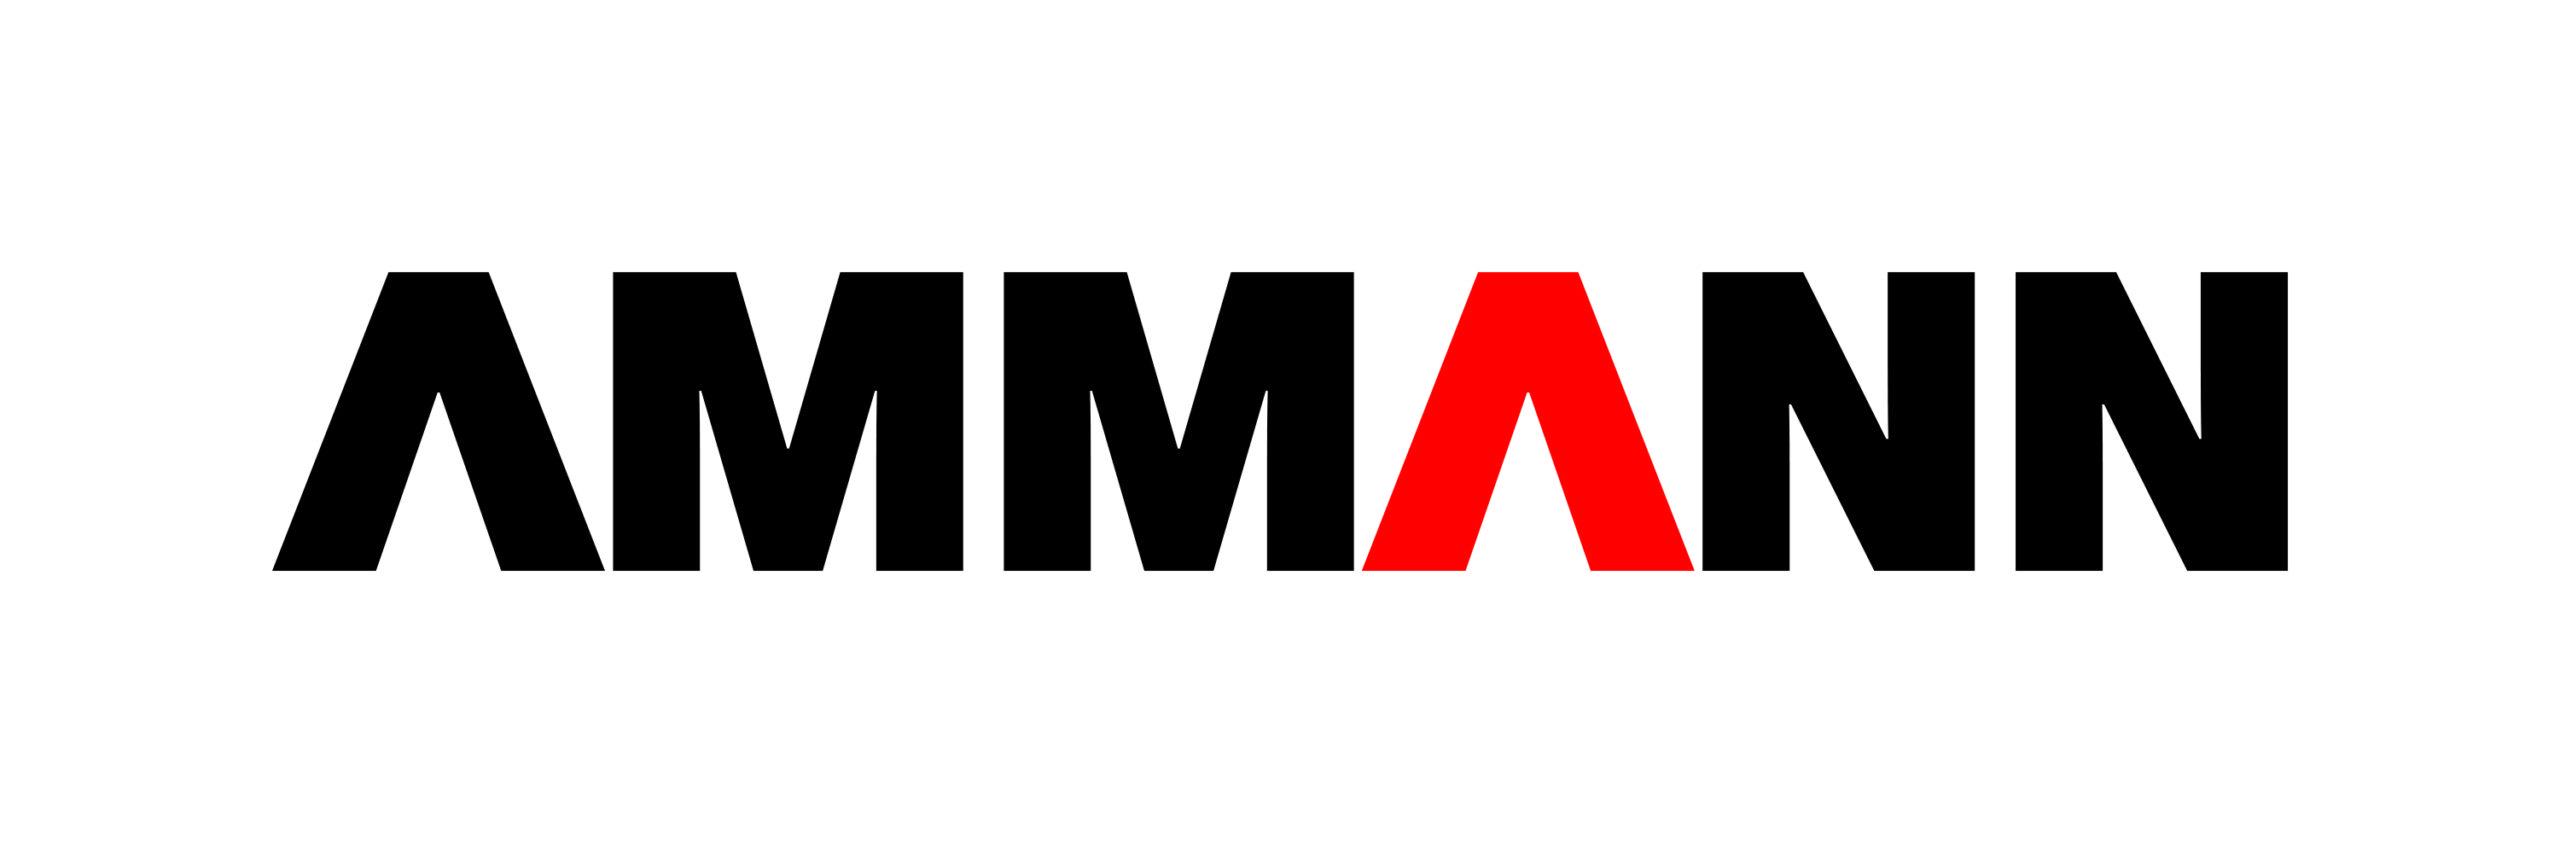 ammann-logo-color-positive